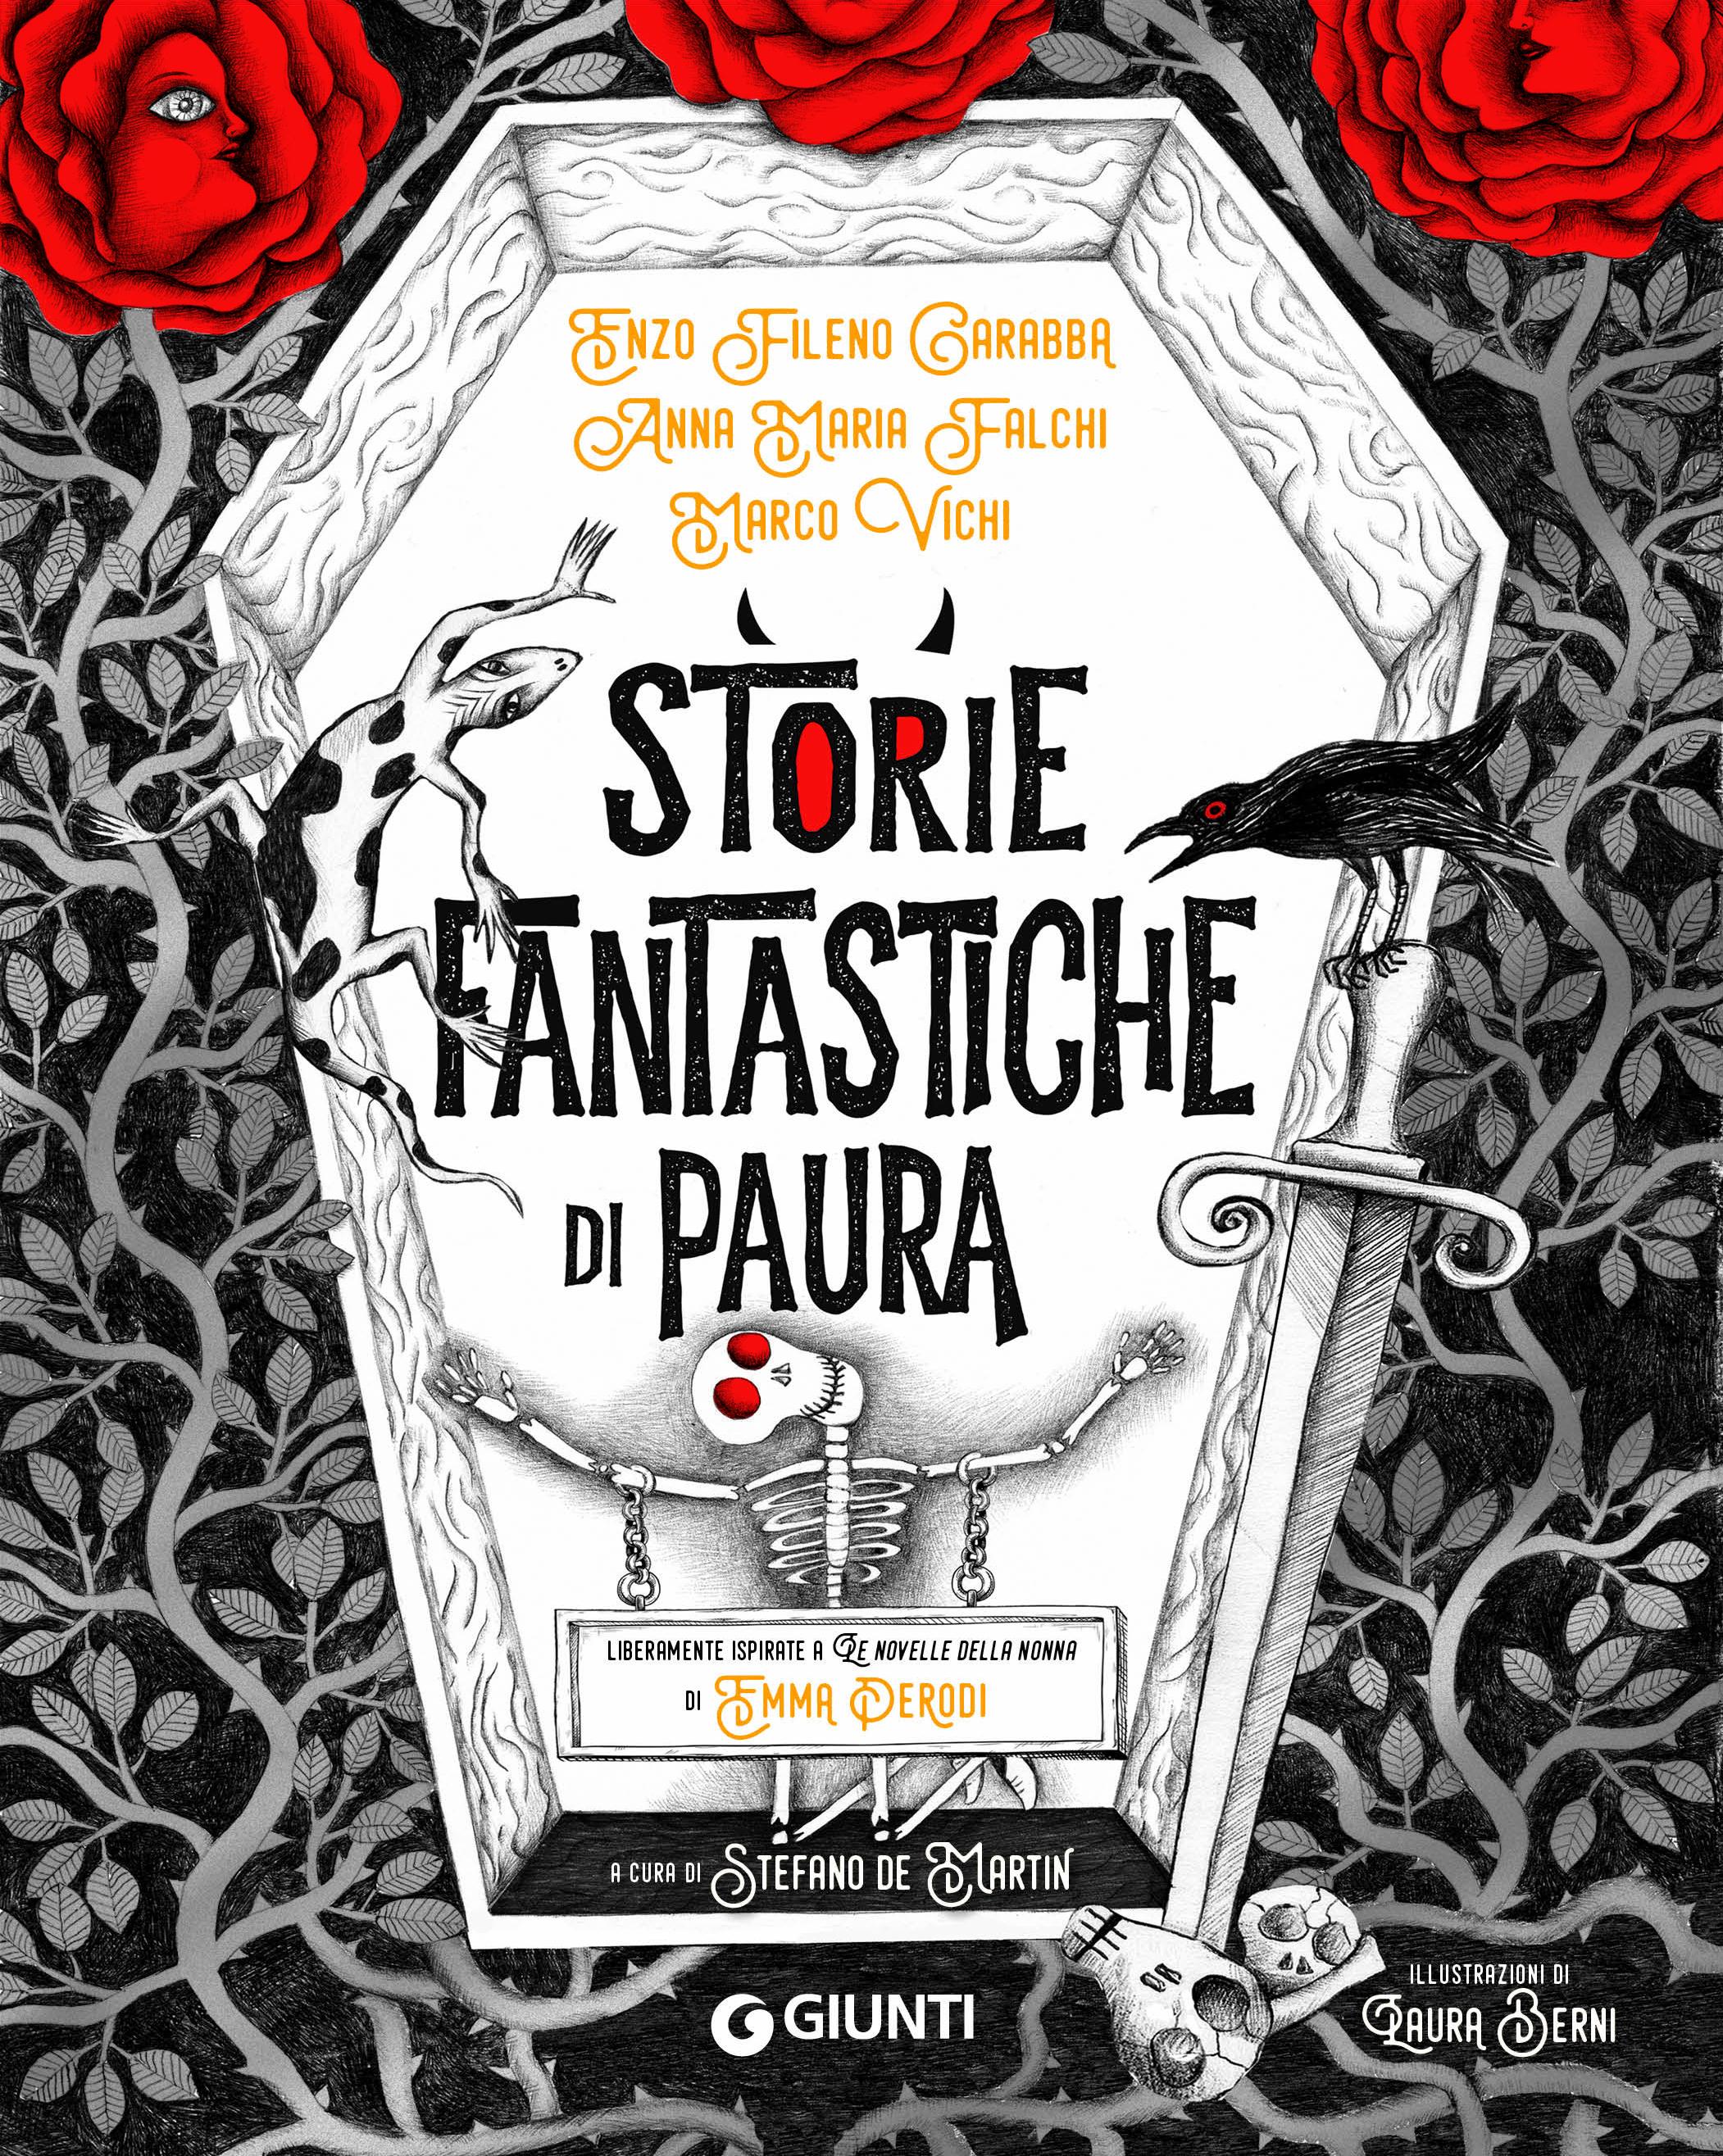 Storie fantastiche di paura (Fantastic horror stories)